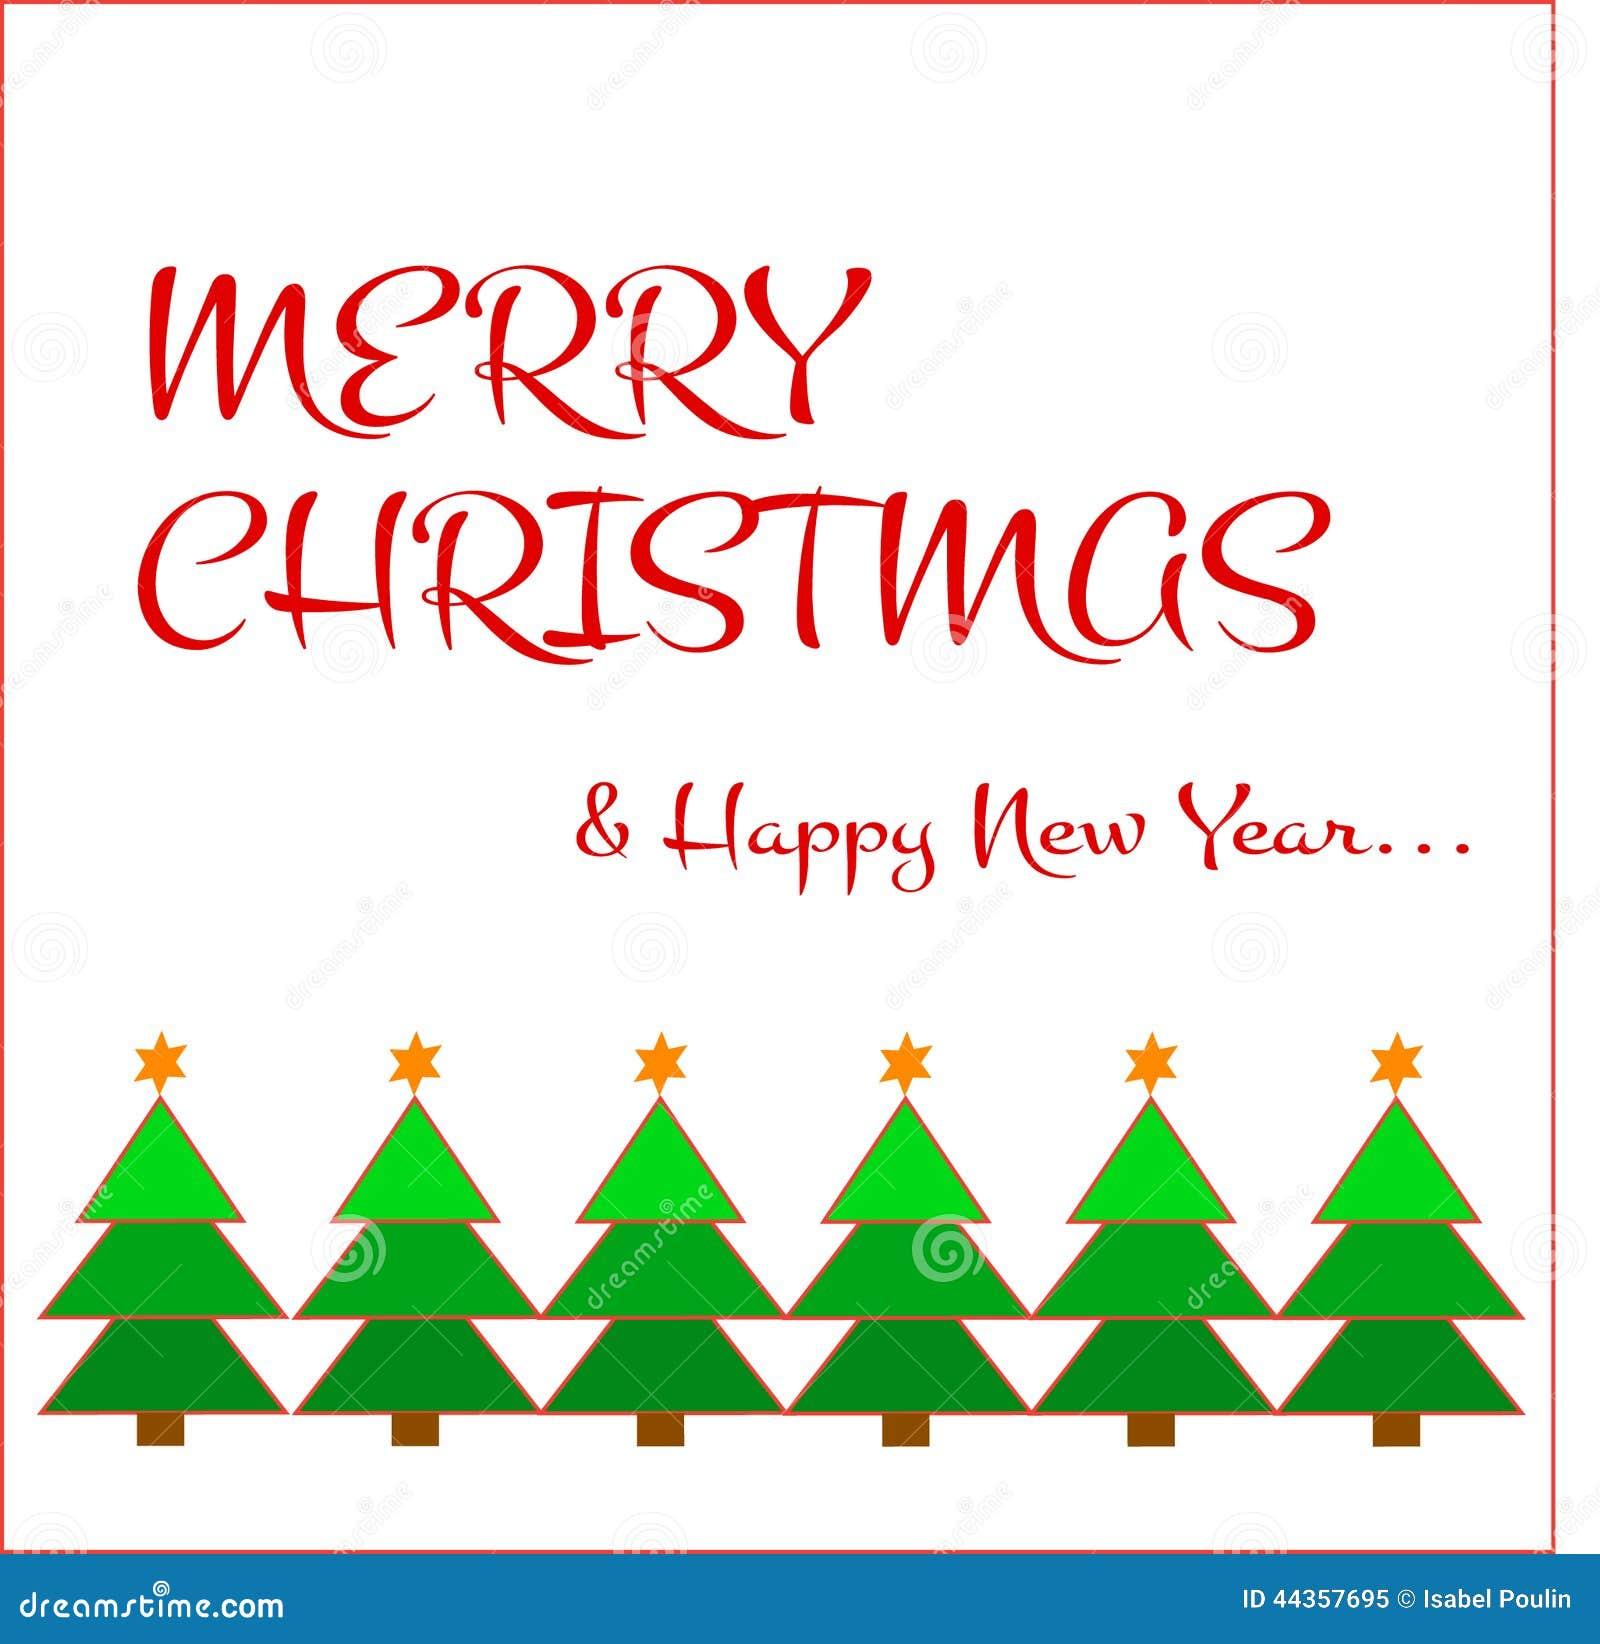 Merry christmas wish stock illustration. Illustration of brown ...